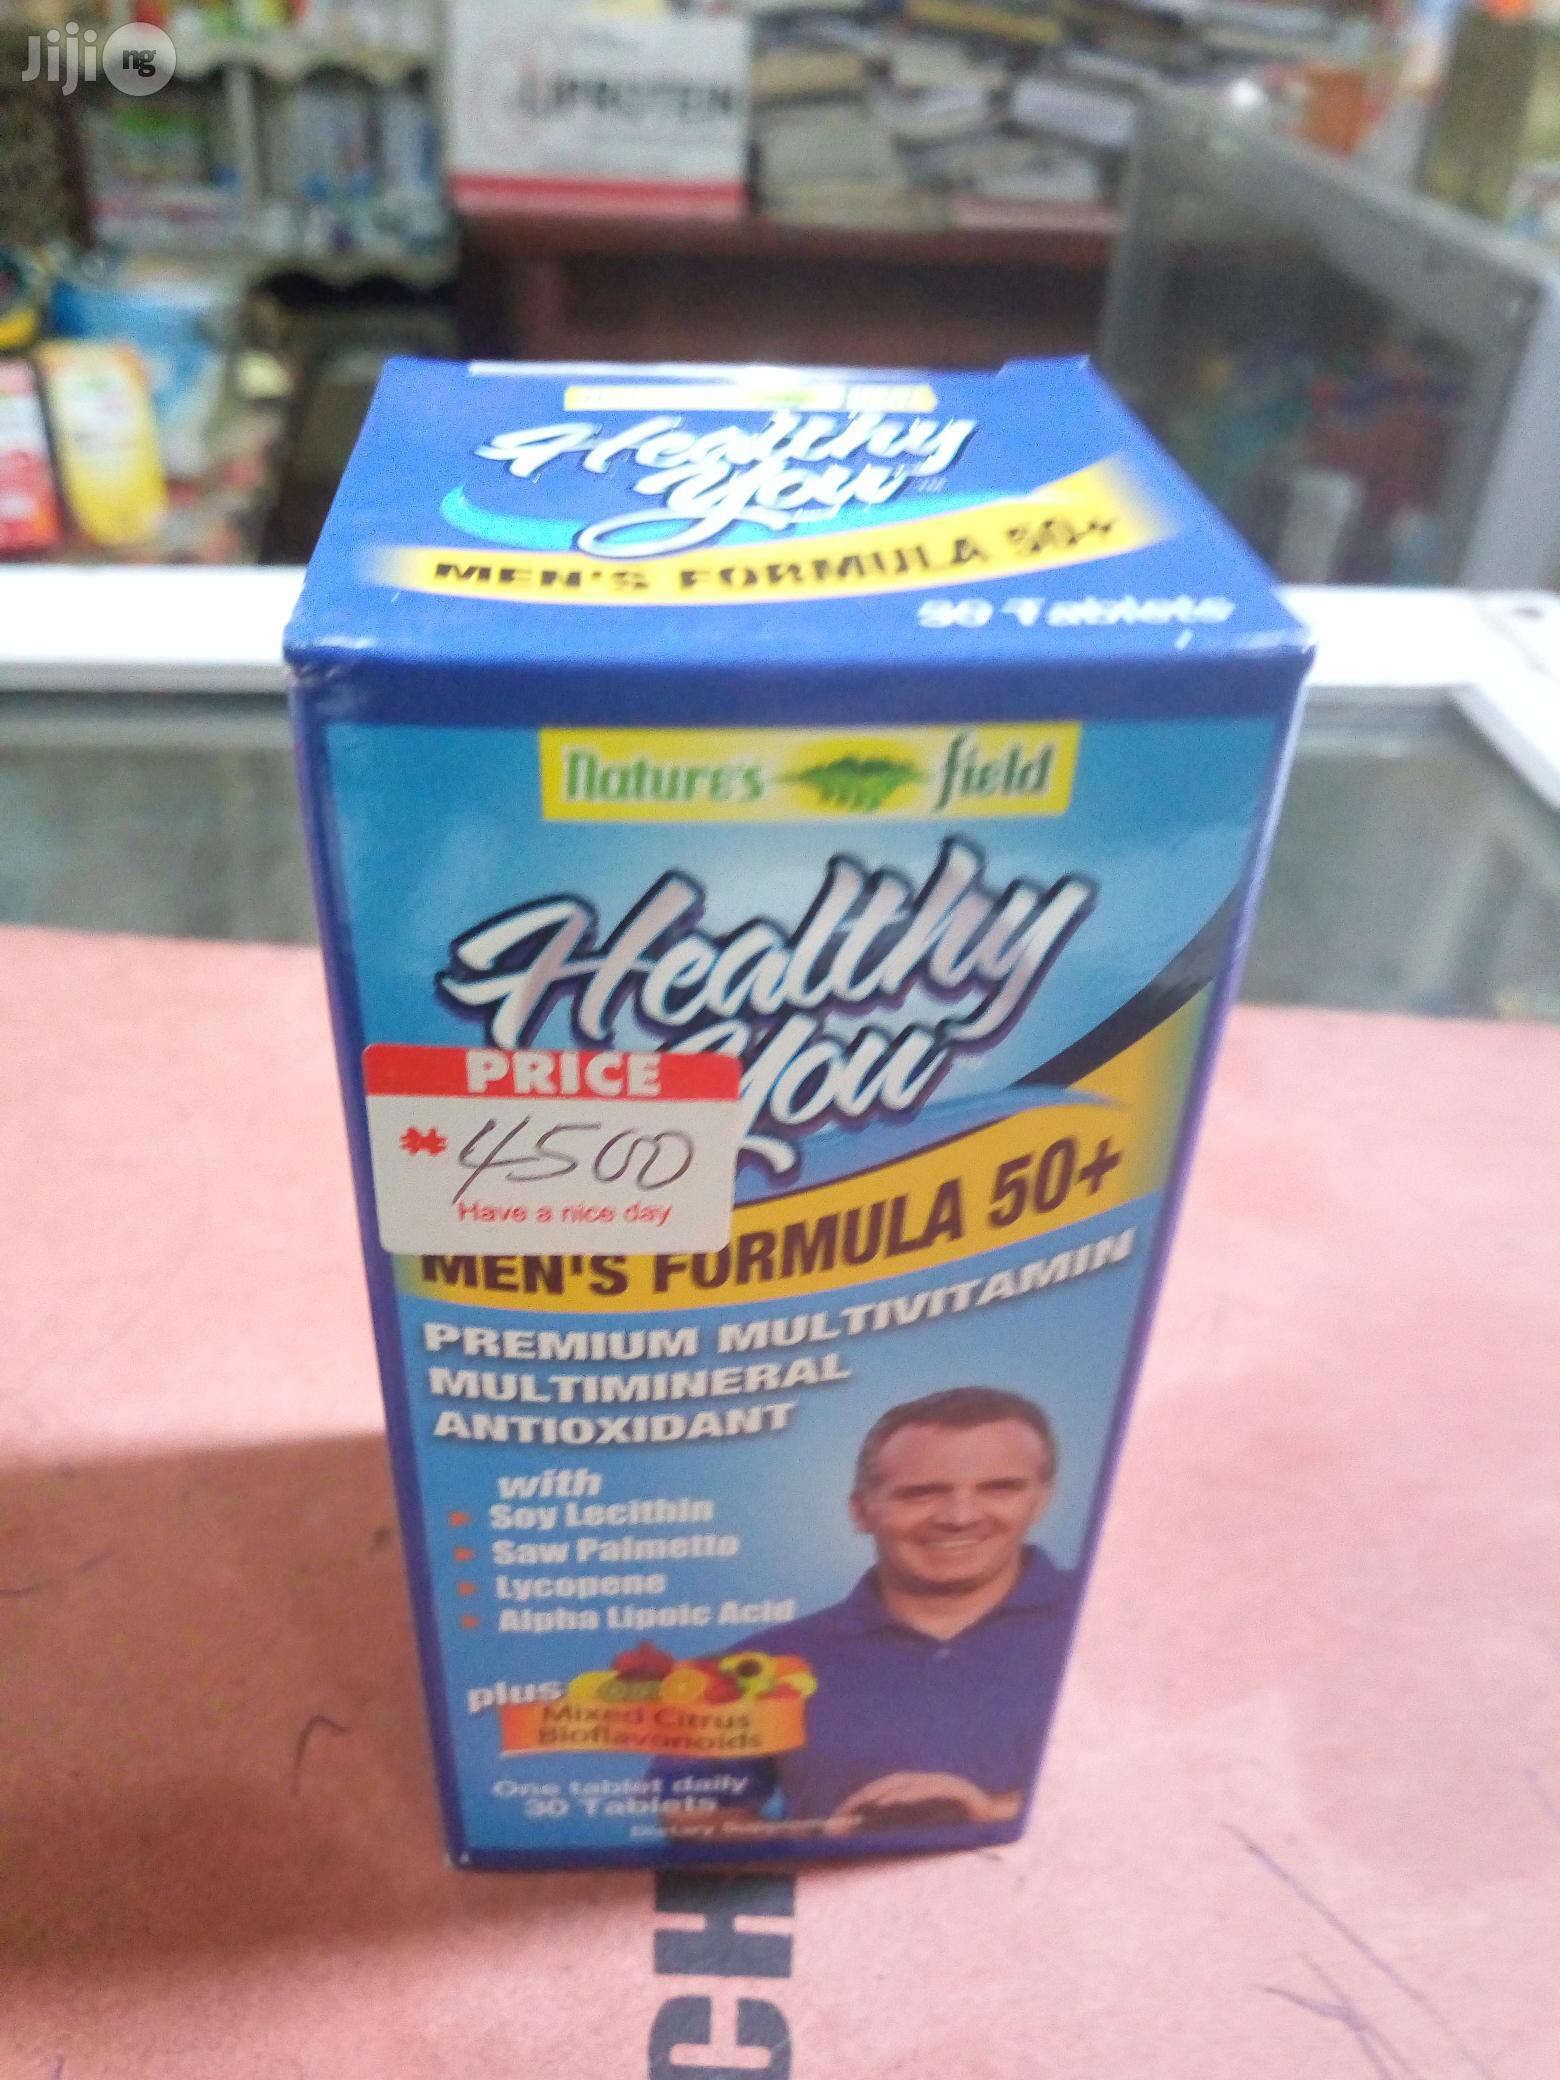 Healthy You Men's Formula Capsule.